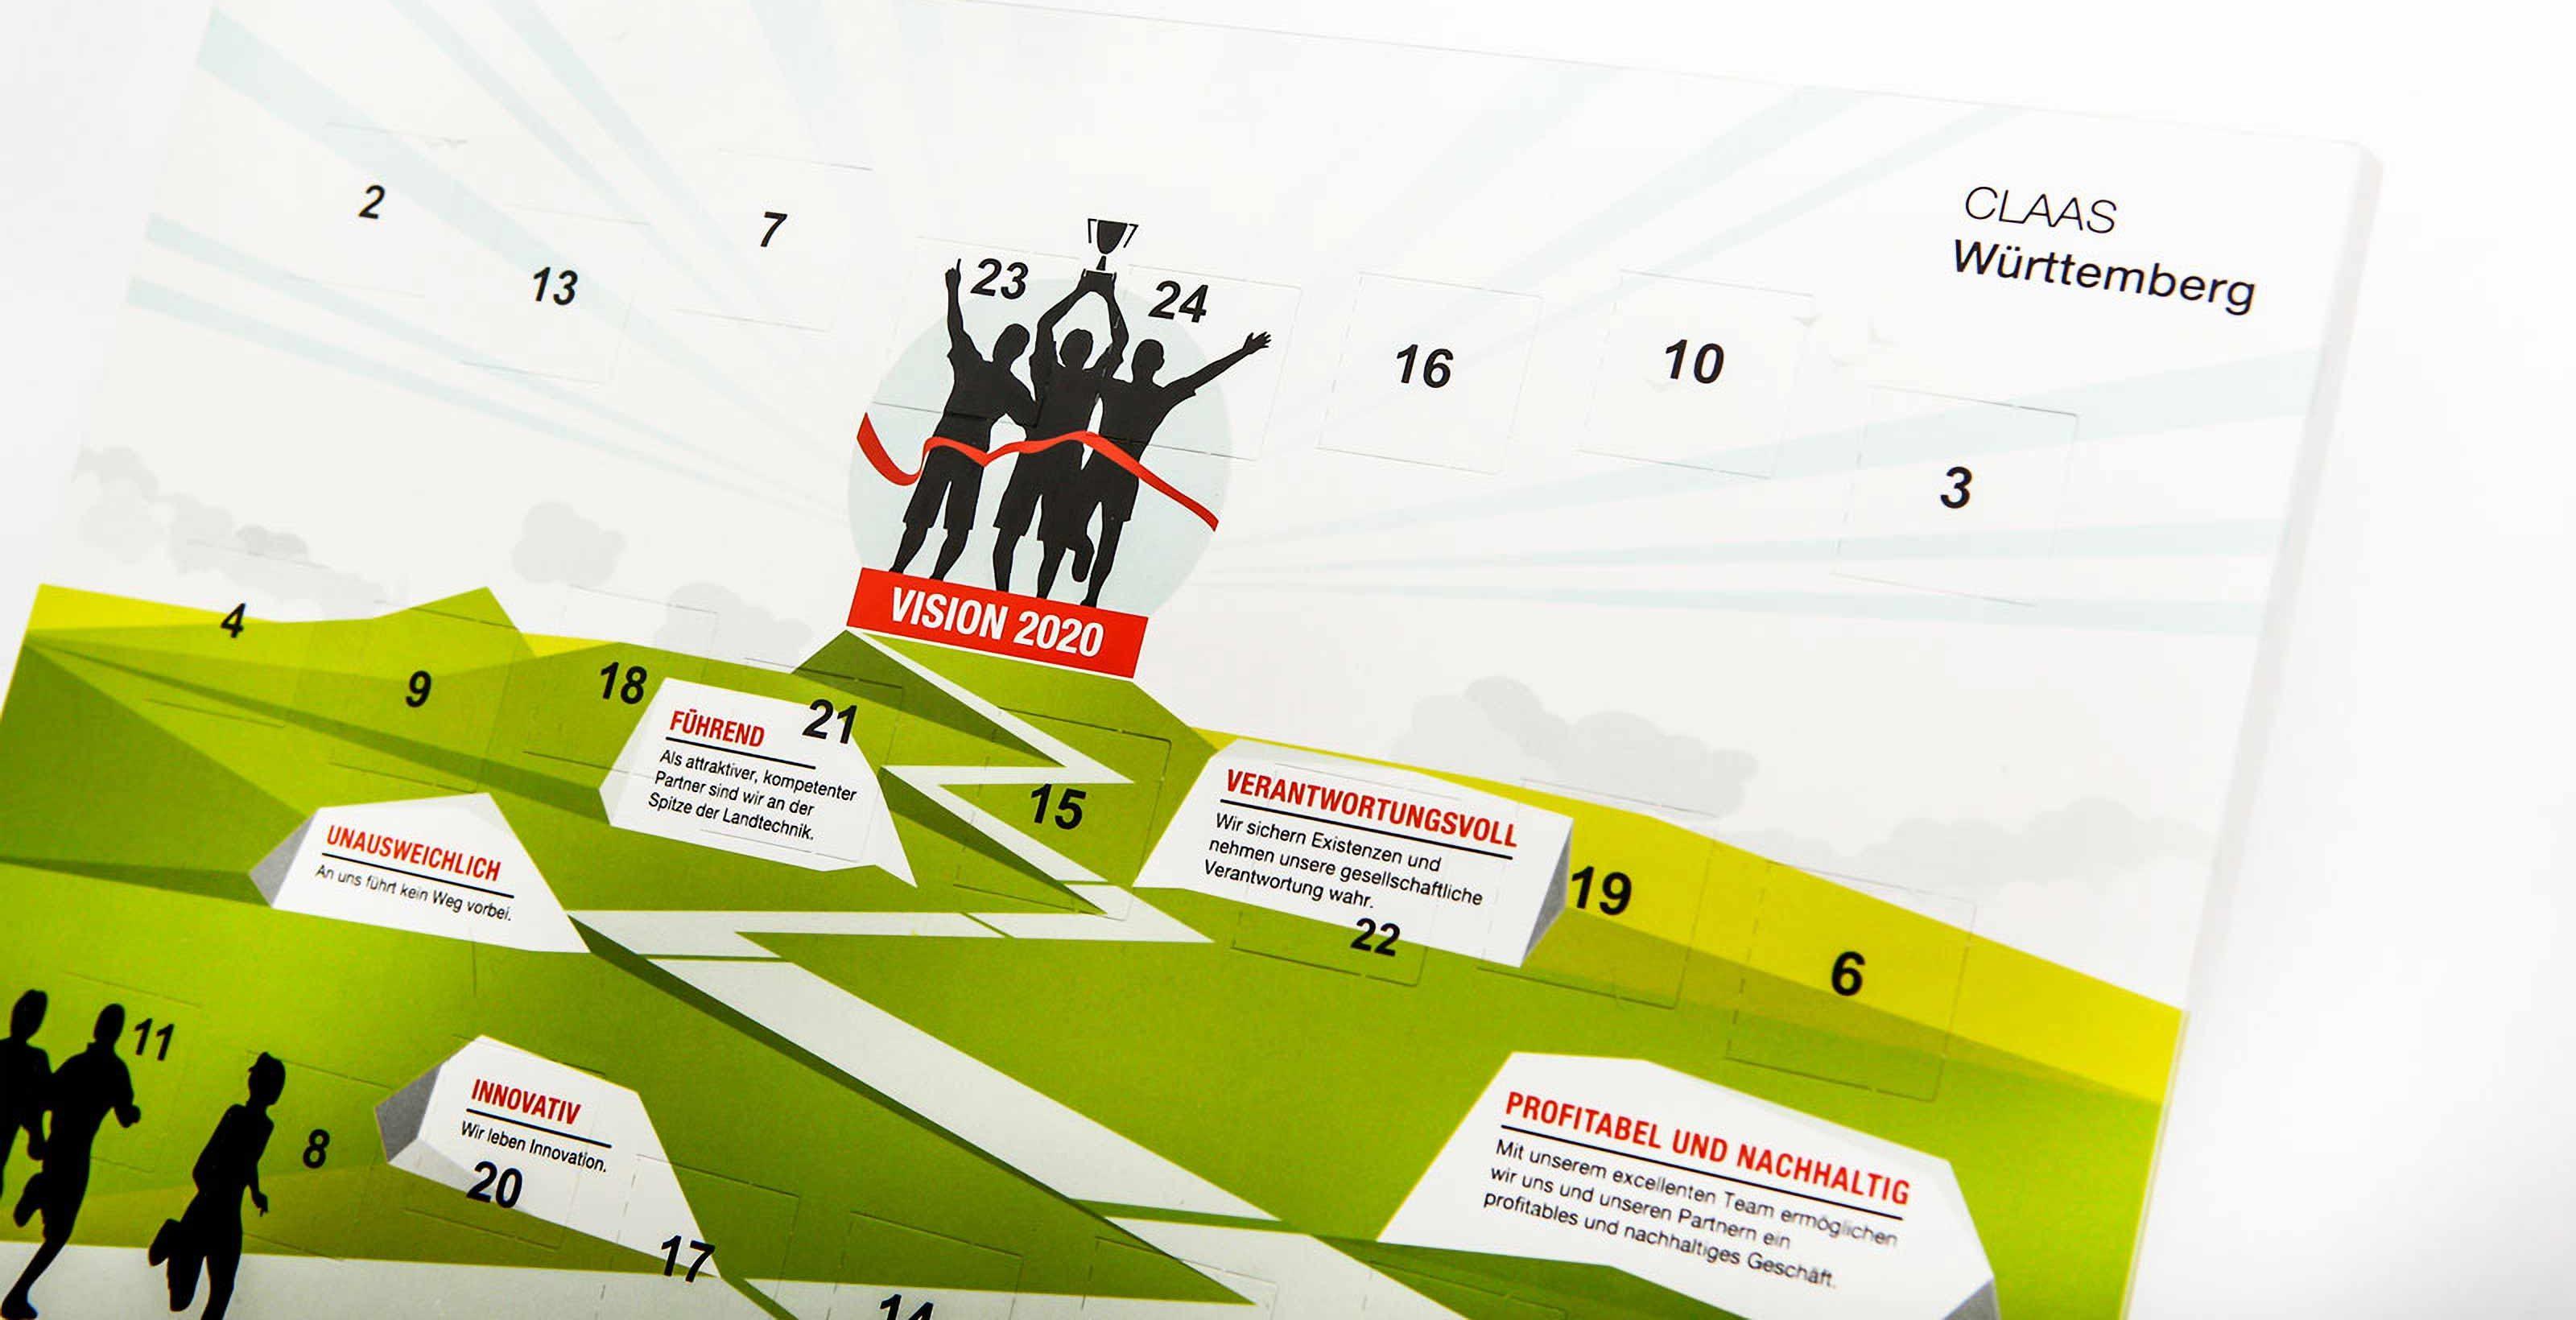 Leitbildvisualisierung Claas Württemberg